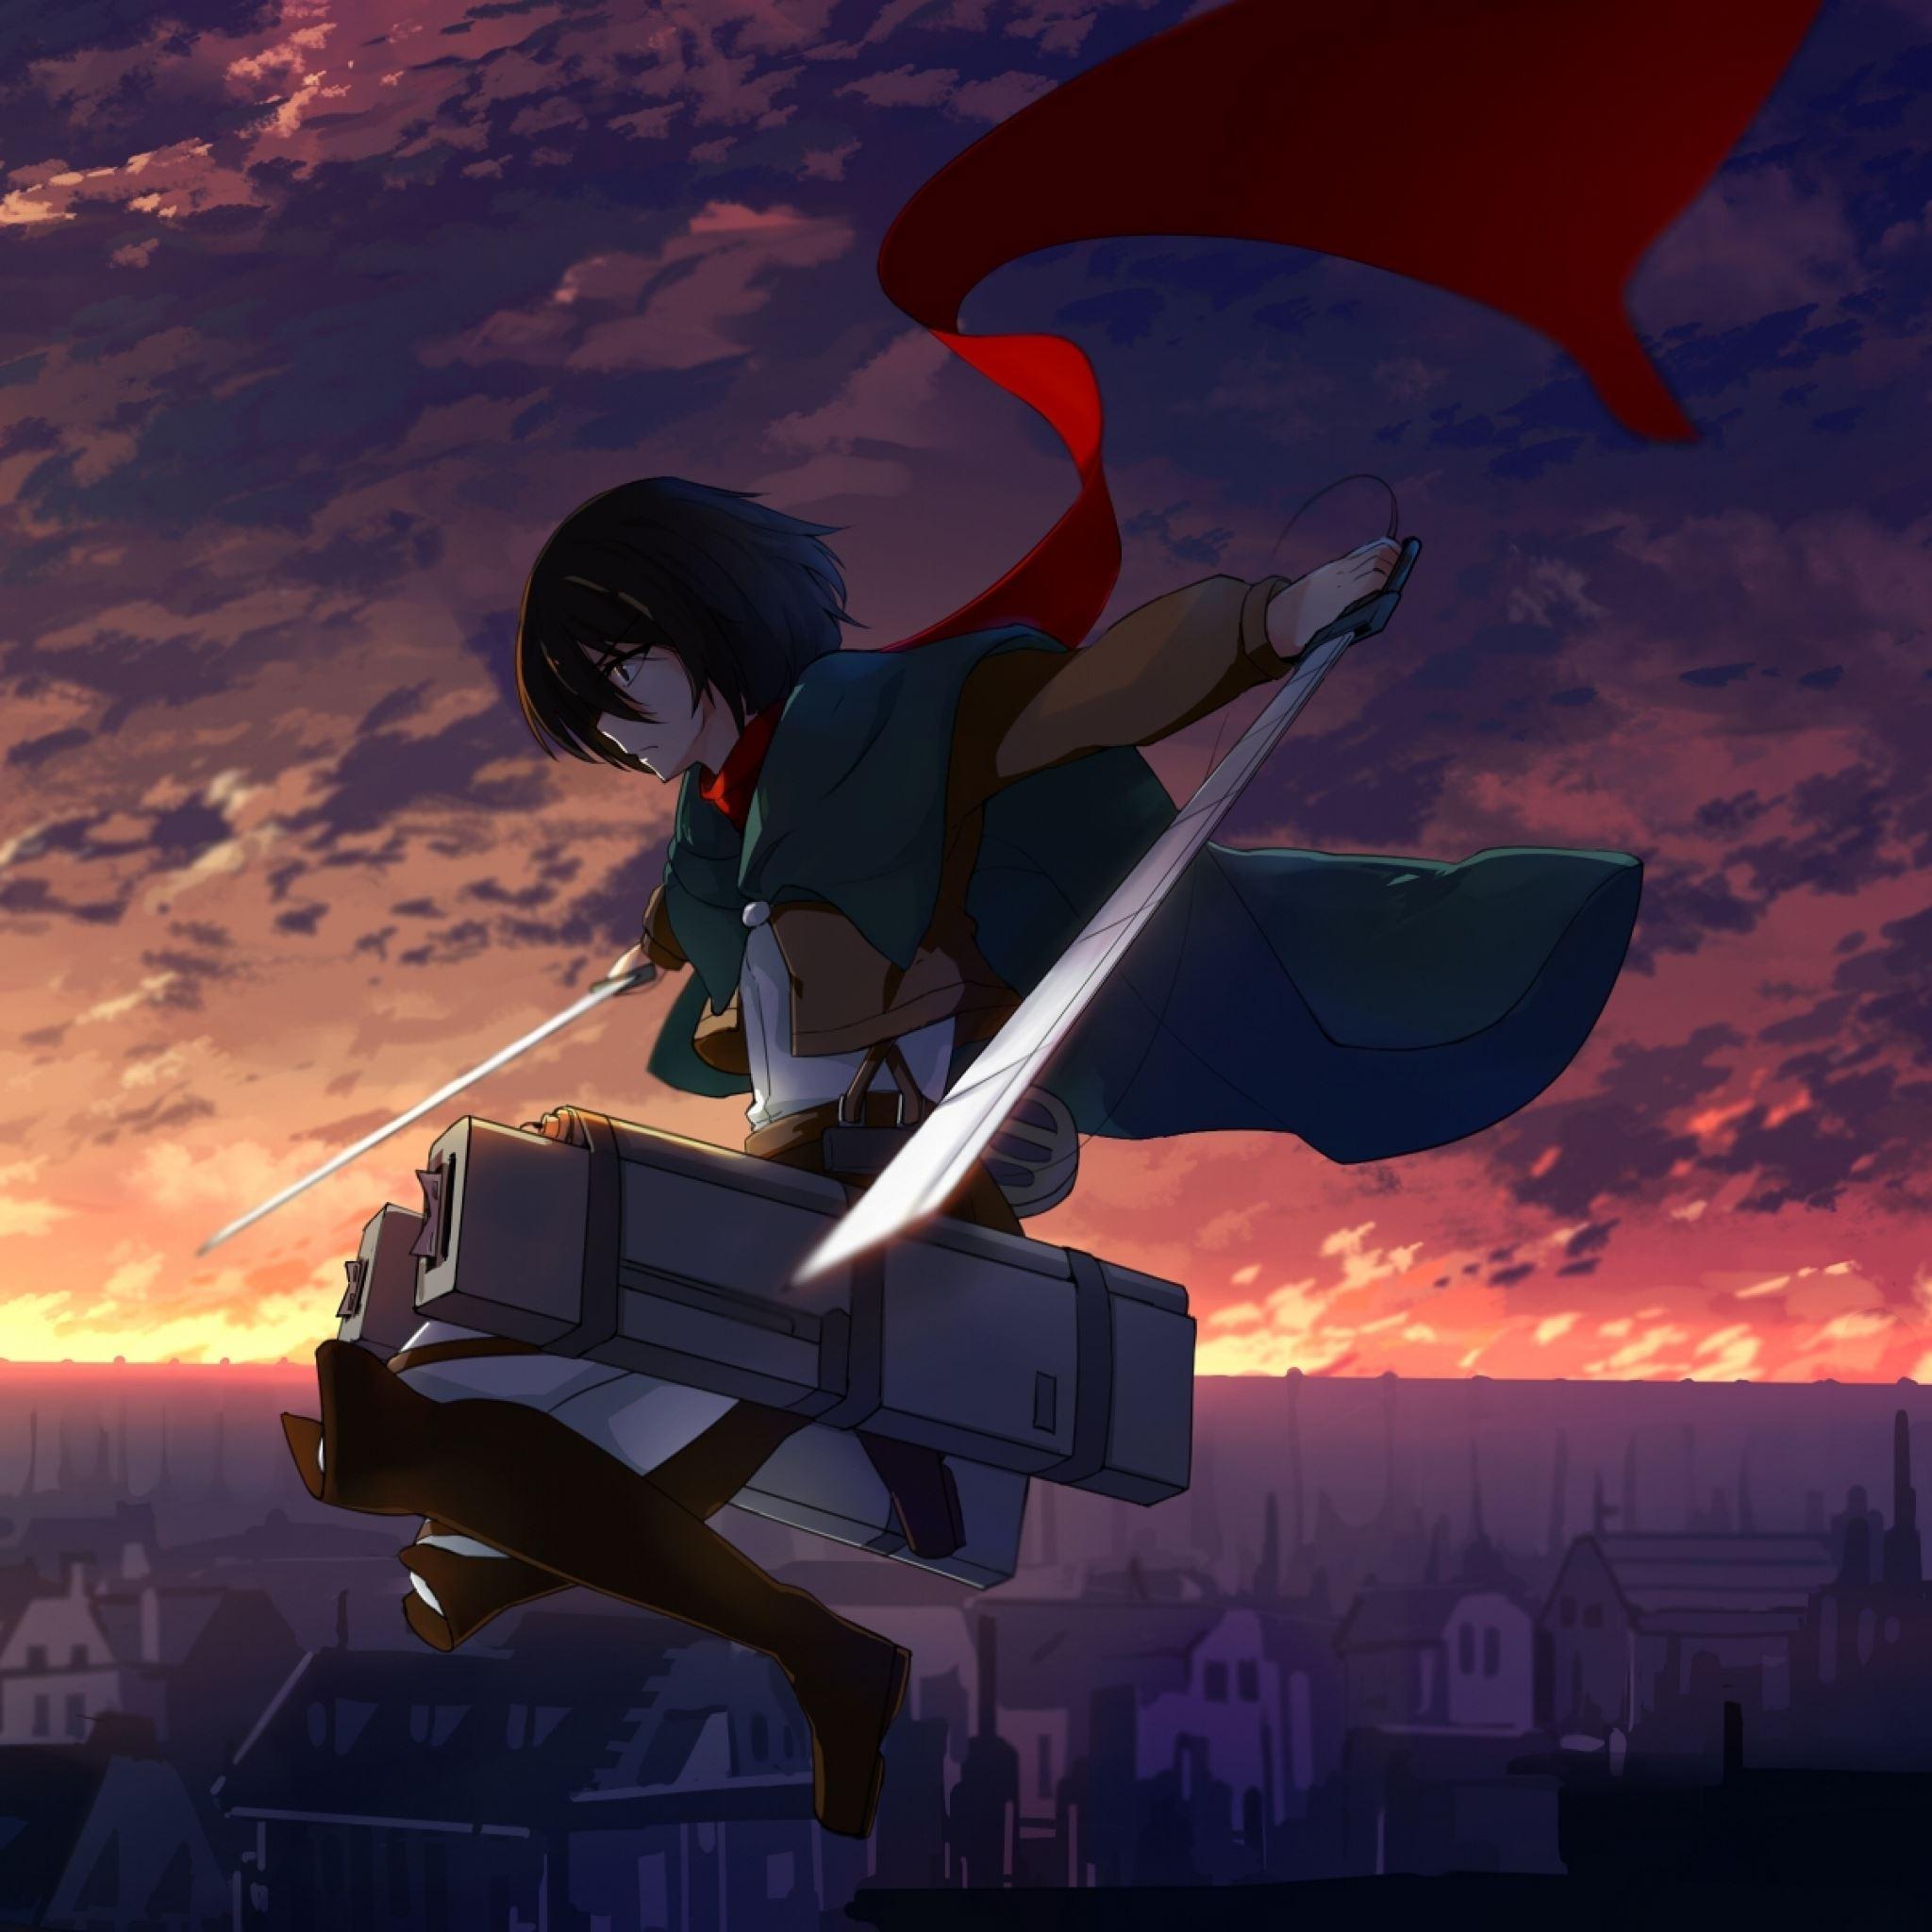 Anime Shingeki No Kyojin Mikasa Ackerman Ipad Air Wallpapers Free Download